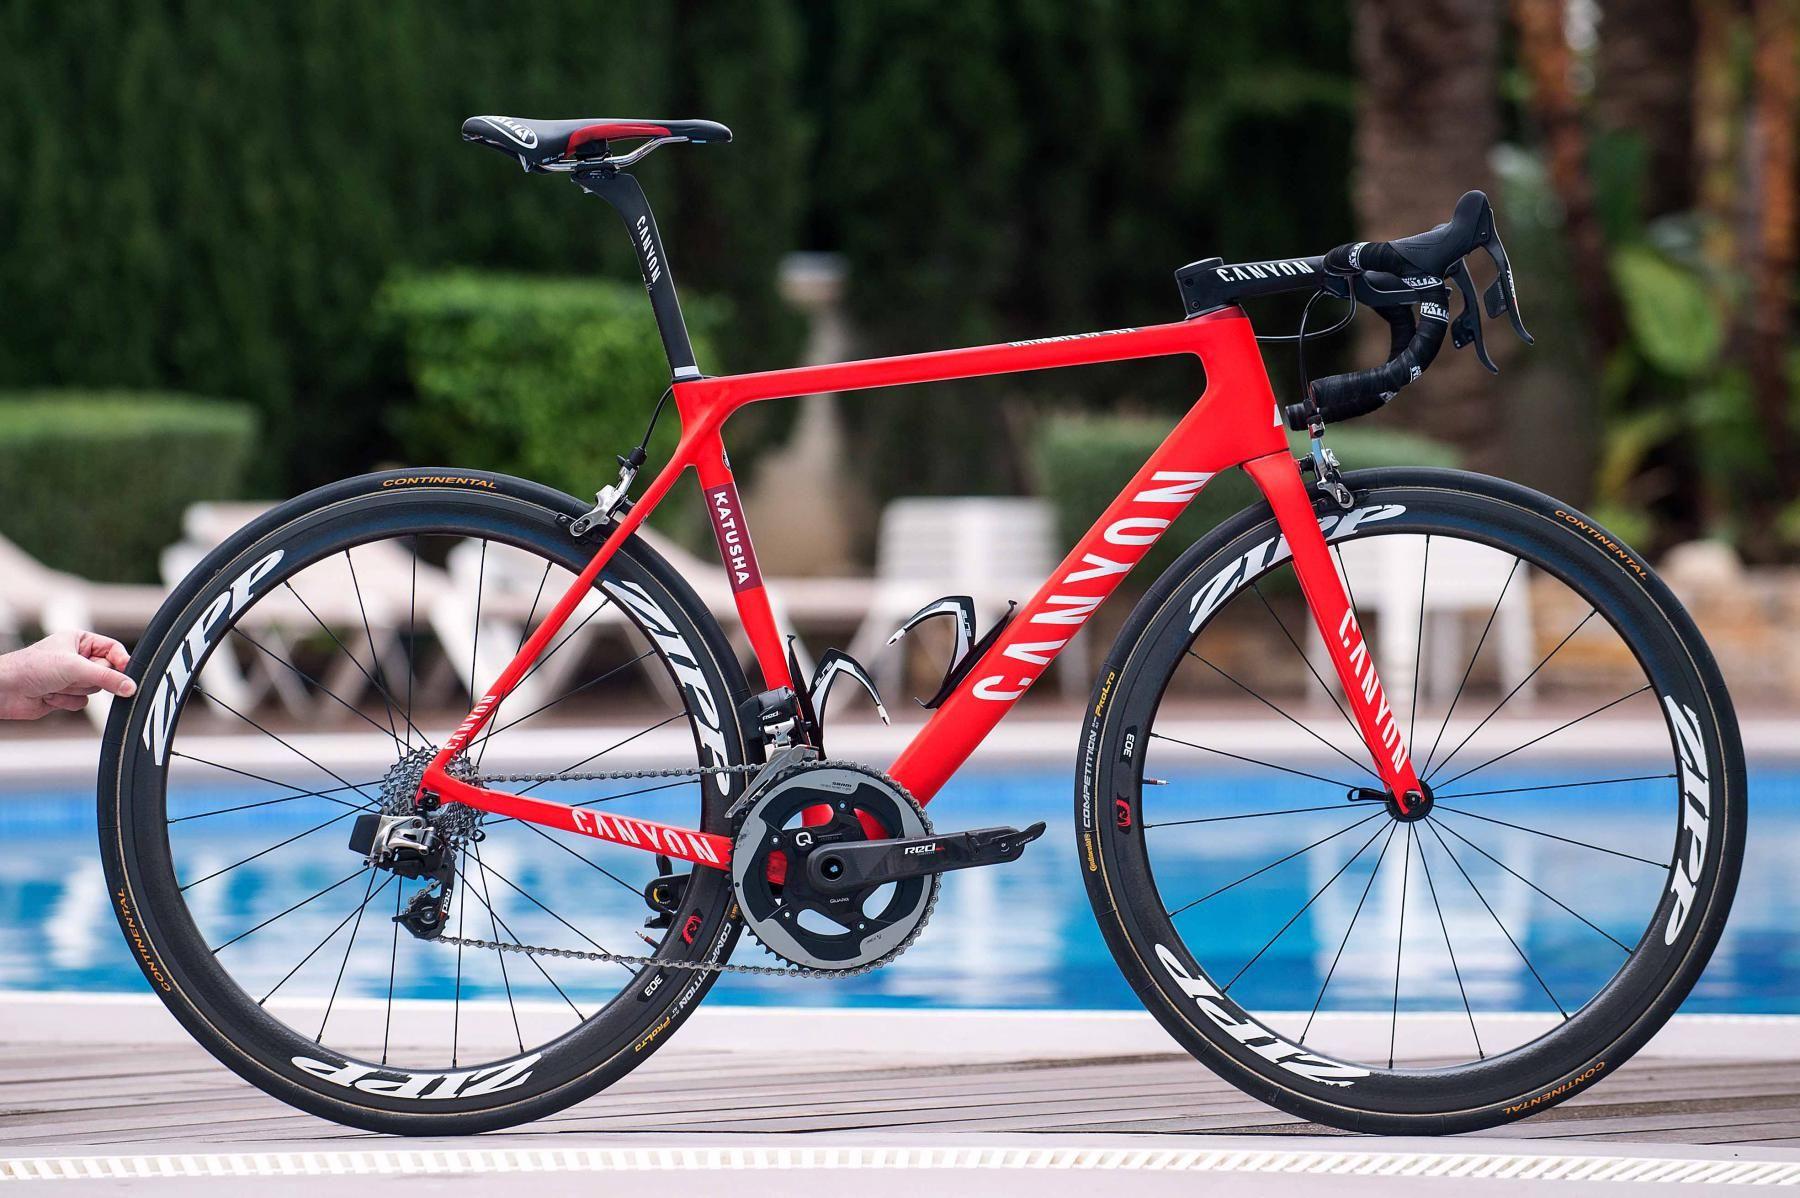 Team KATUSHA bikes  Canyon Aeroad and Canyon Ultimate  57c9c4885